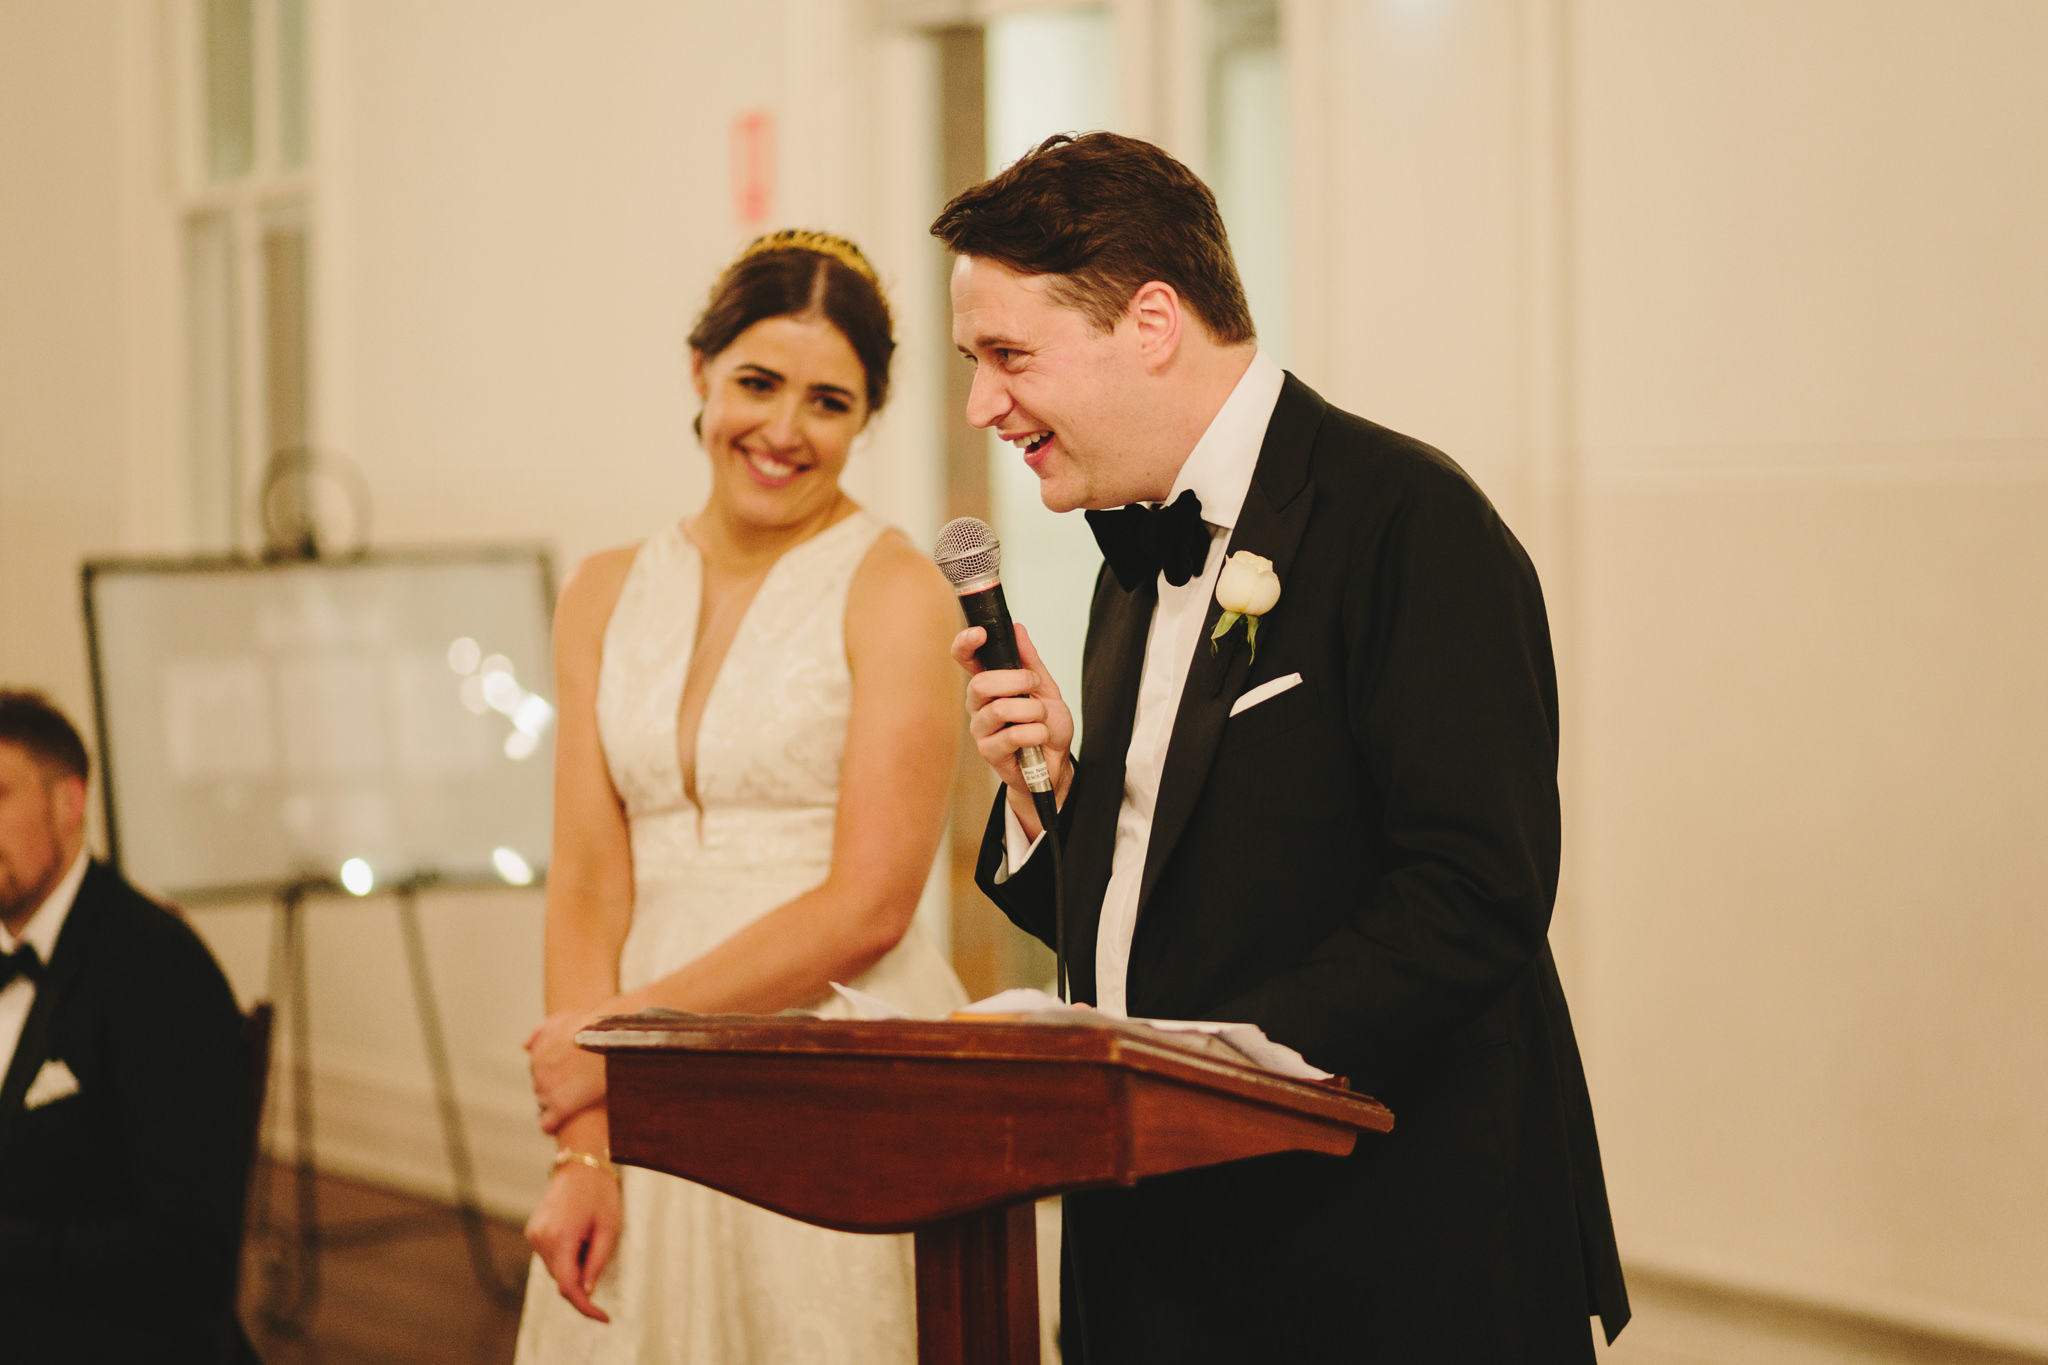 Abbotsford_Convent_Wedding_Peter_Anna138.JPG